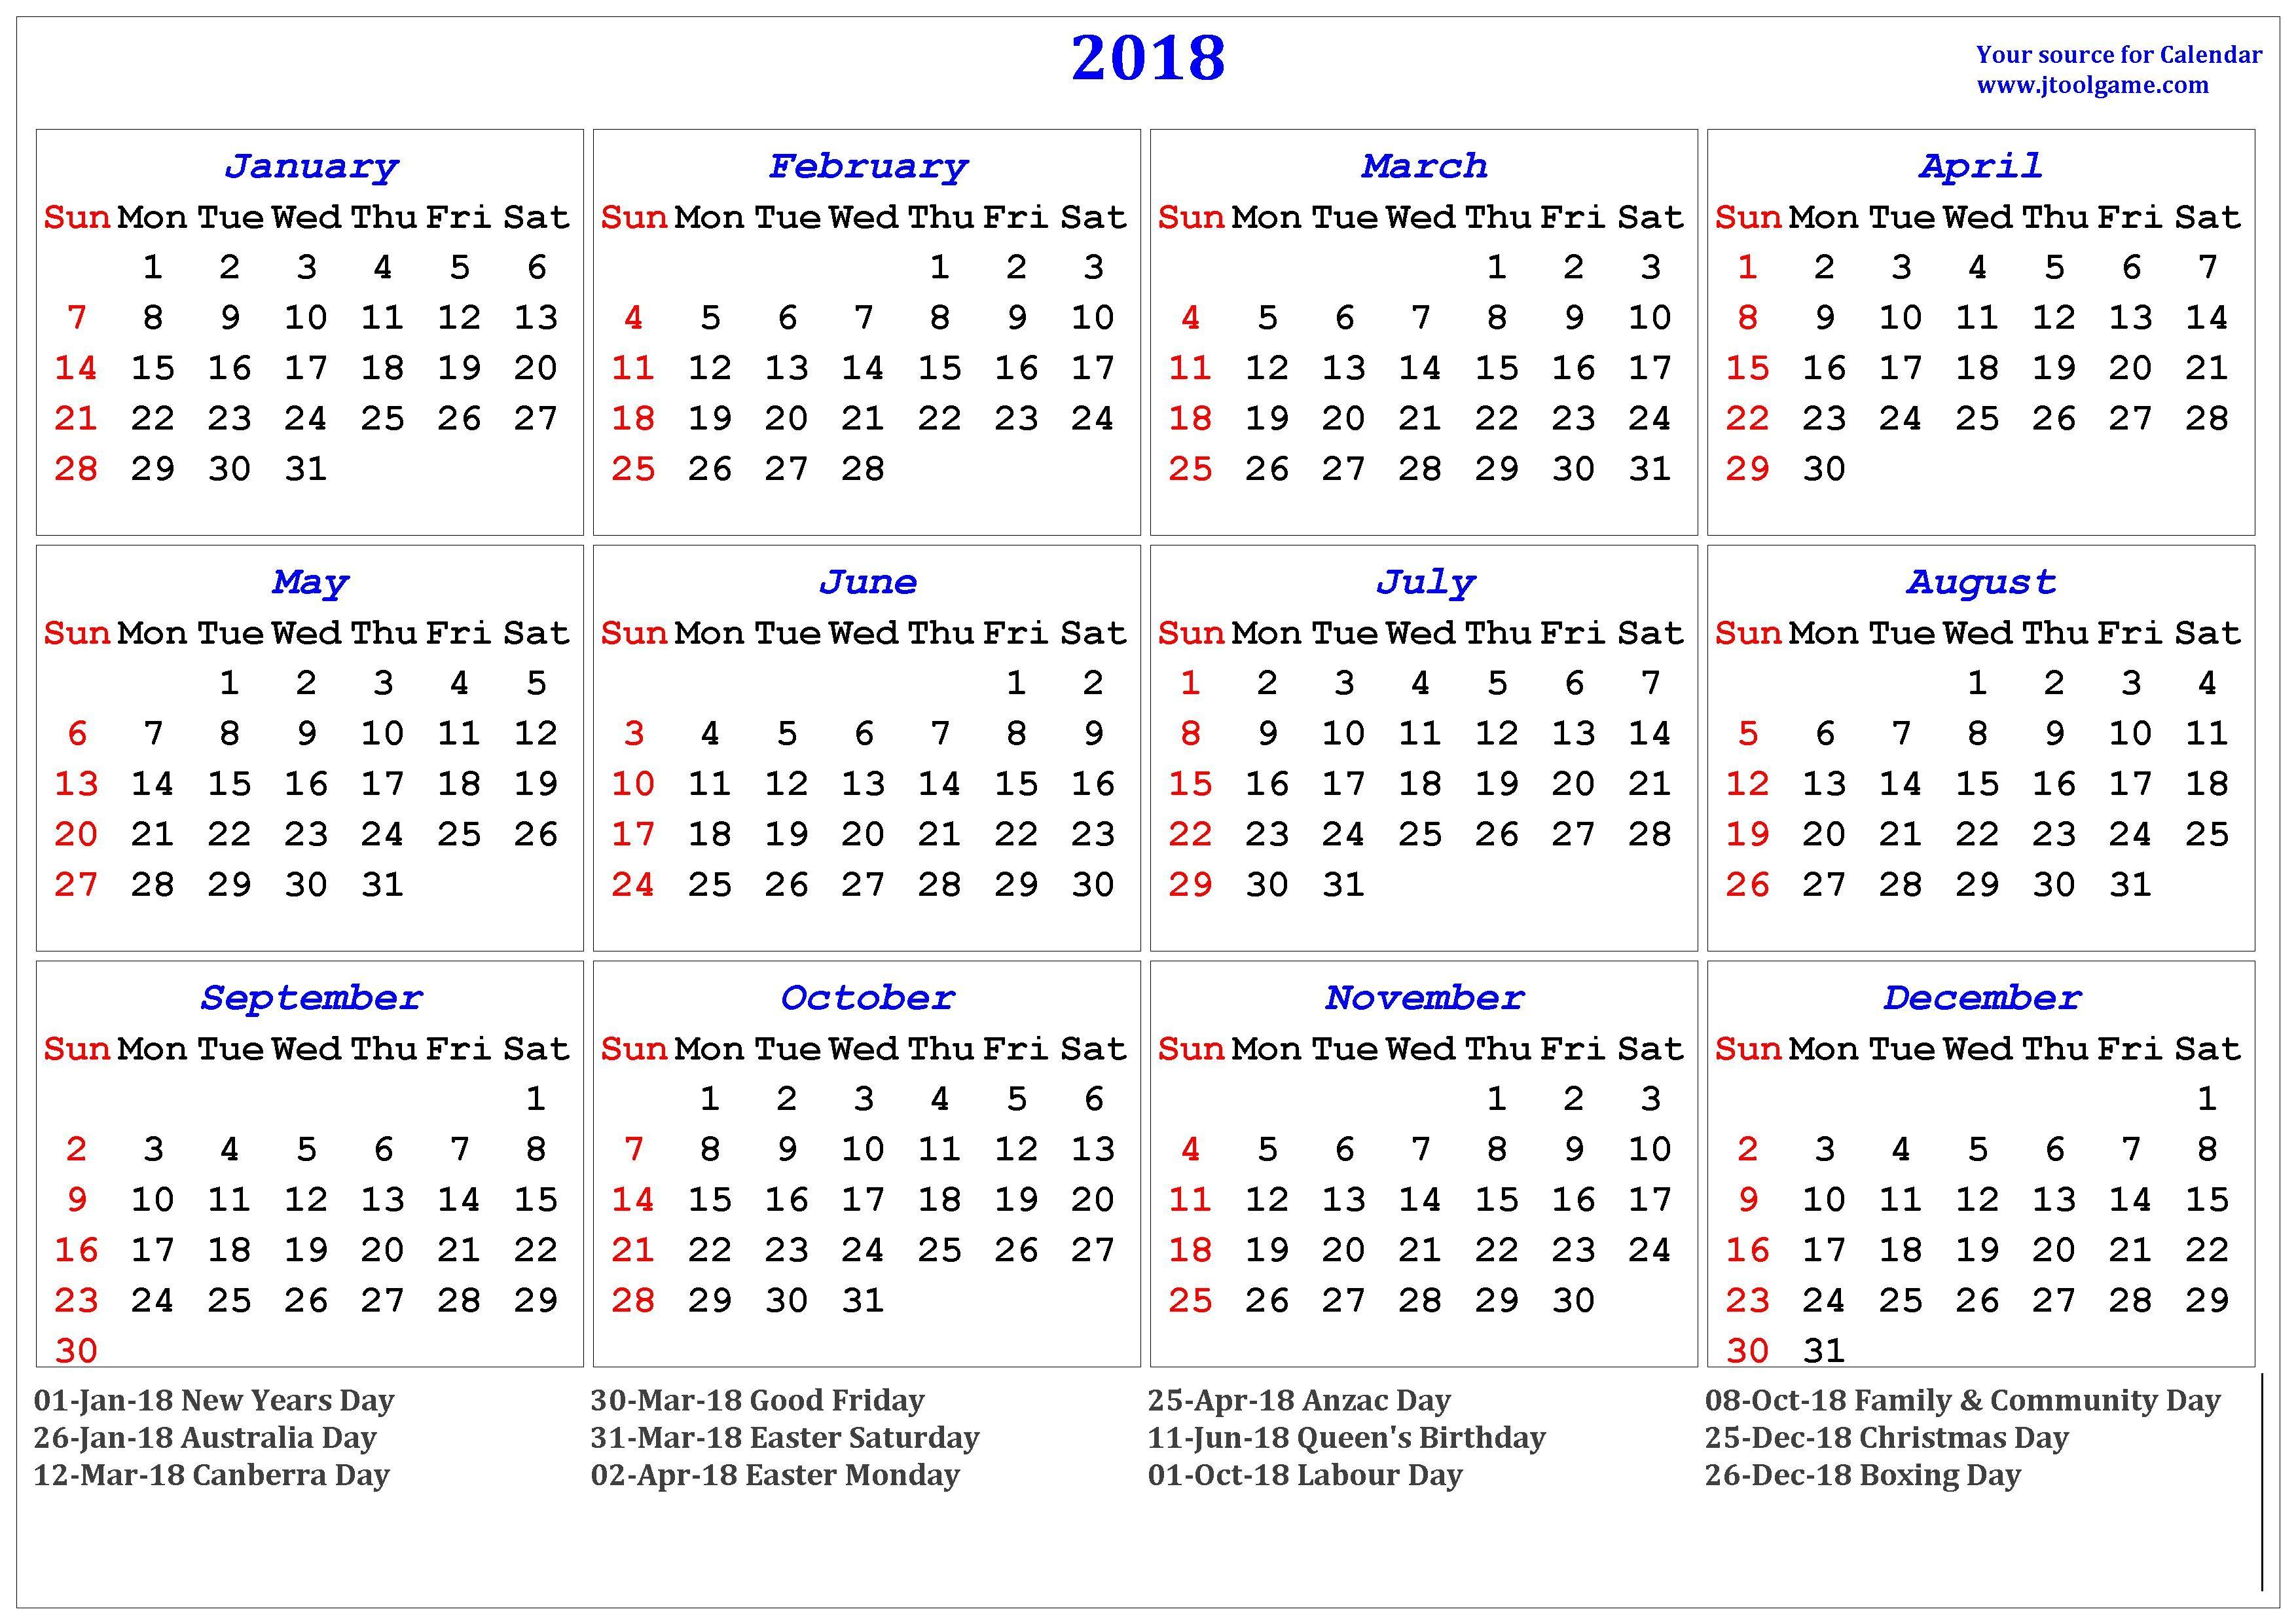 Printable Calendar Australia 2018 Calendar Printable for Free Download India Usa Uk